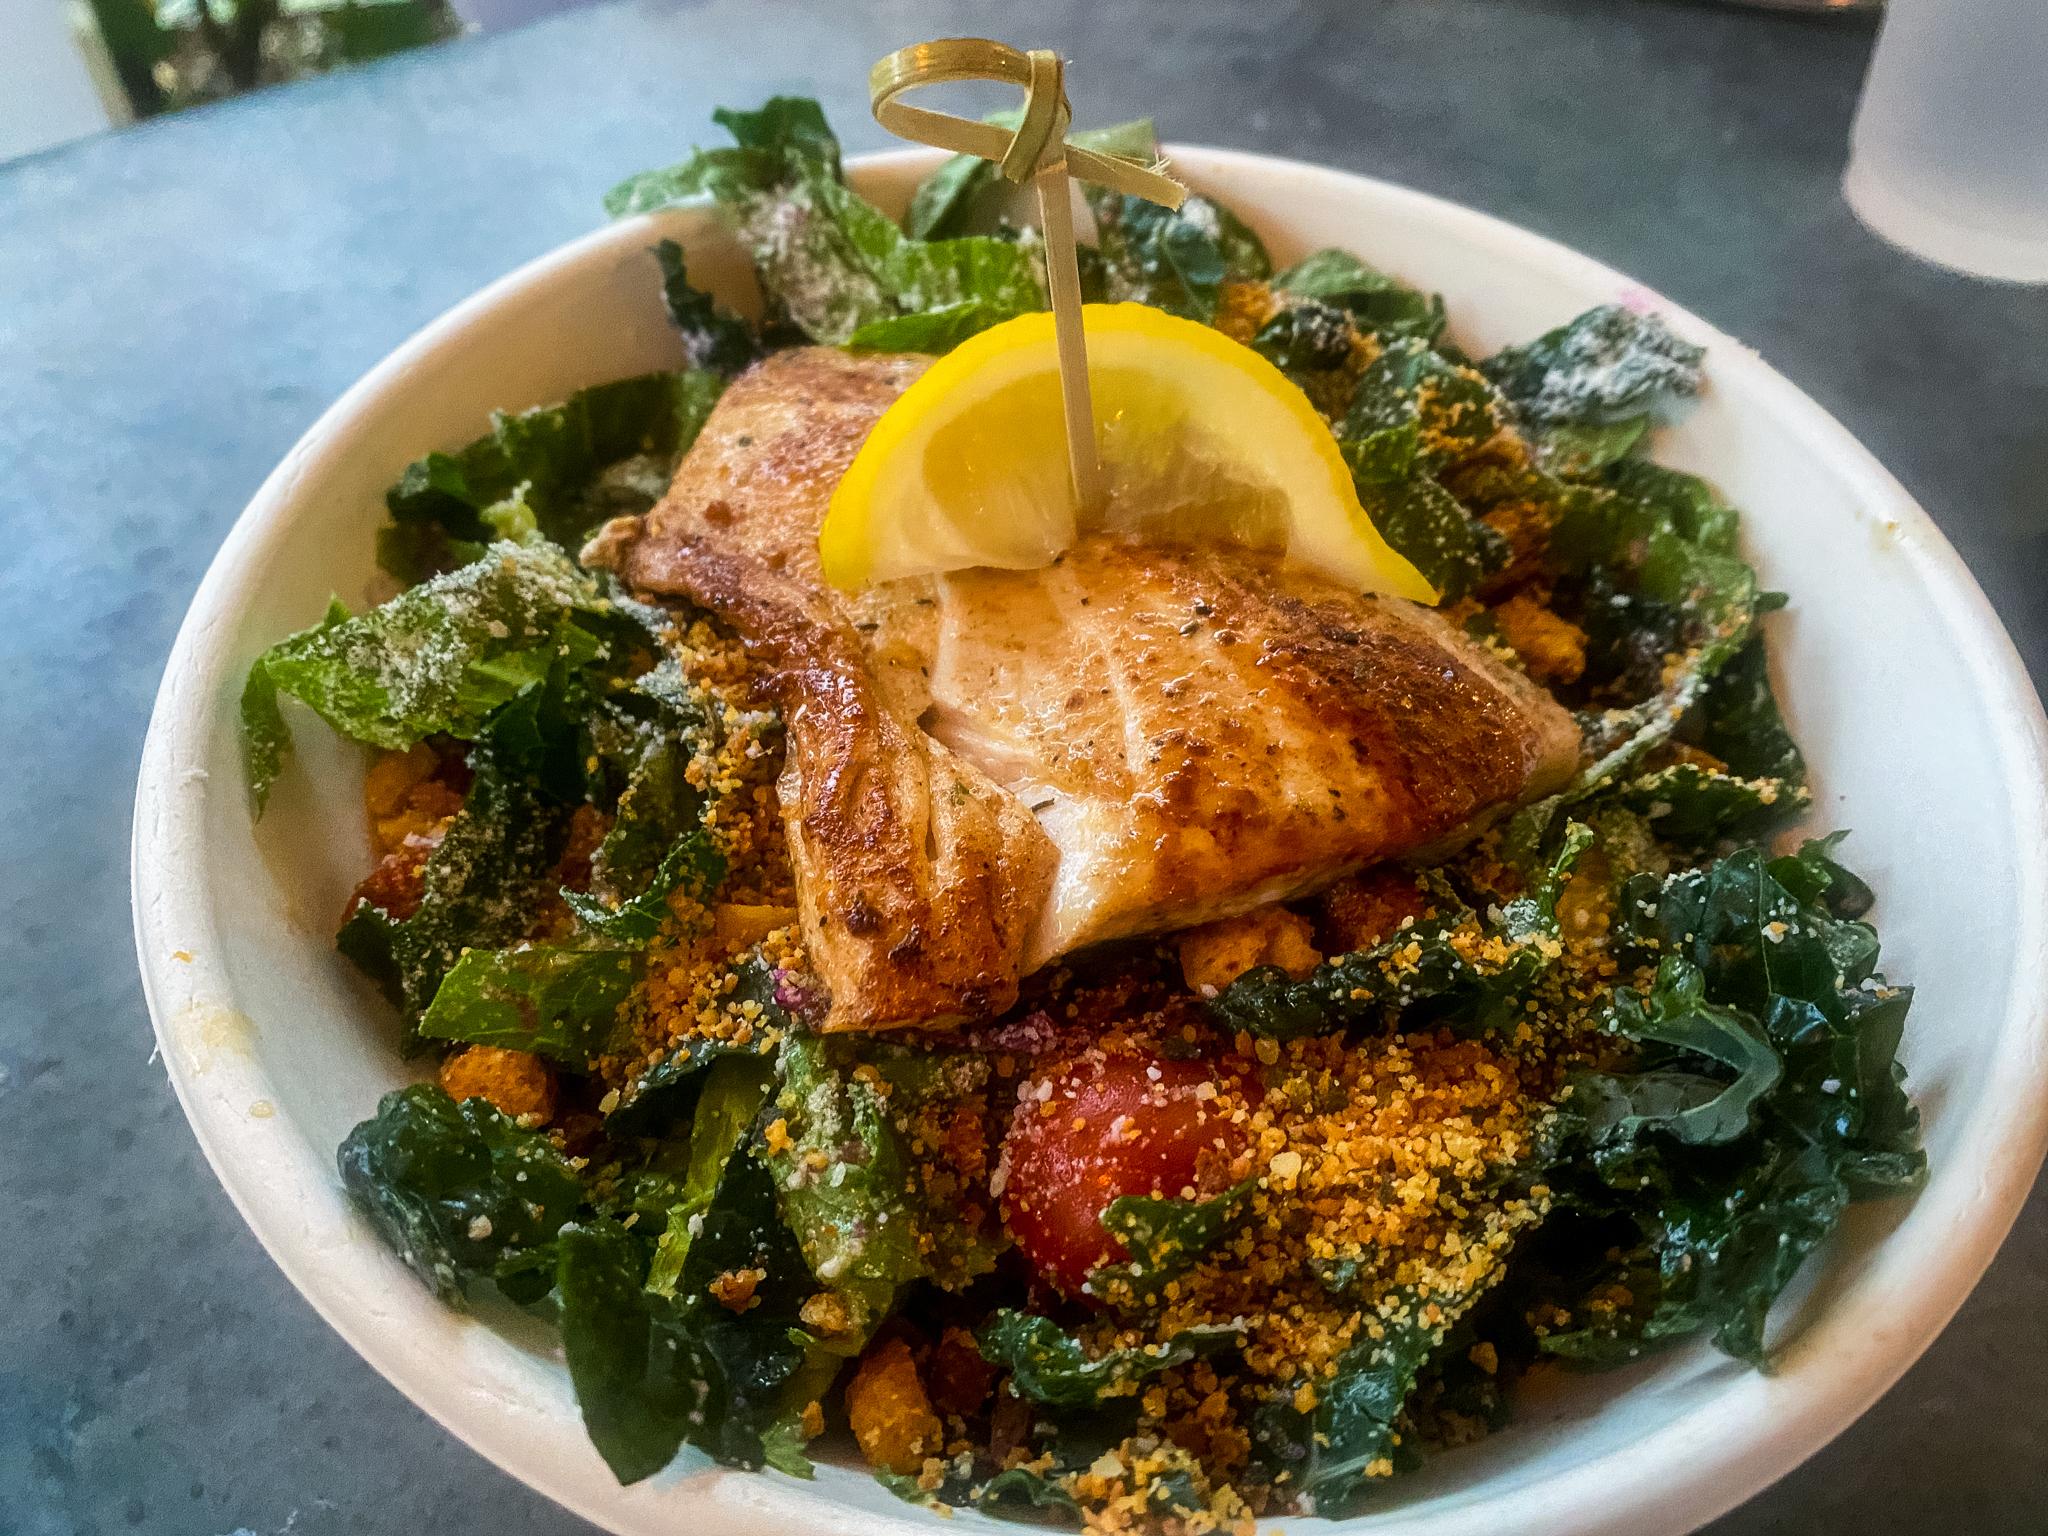 Trophy Fish Mahi Mahi as a Salad